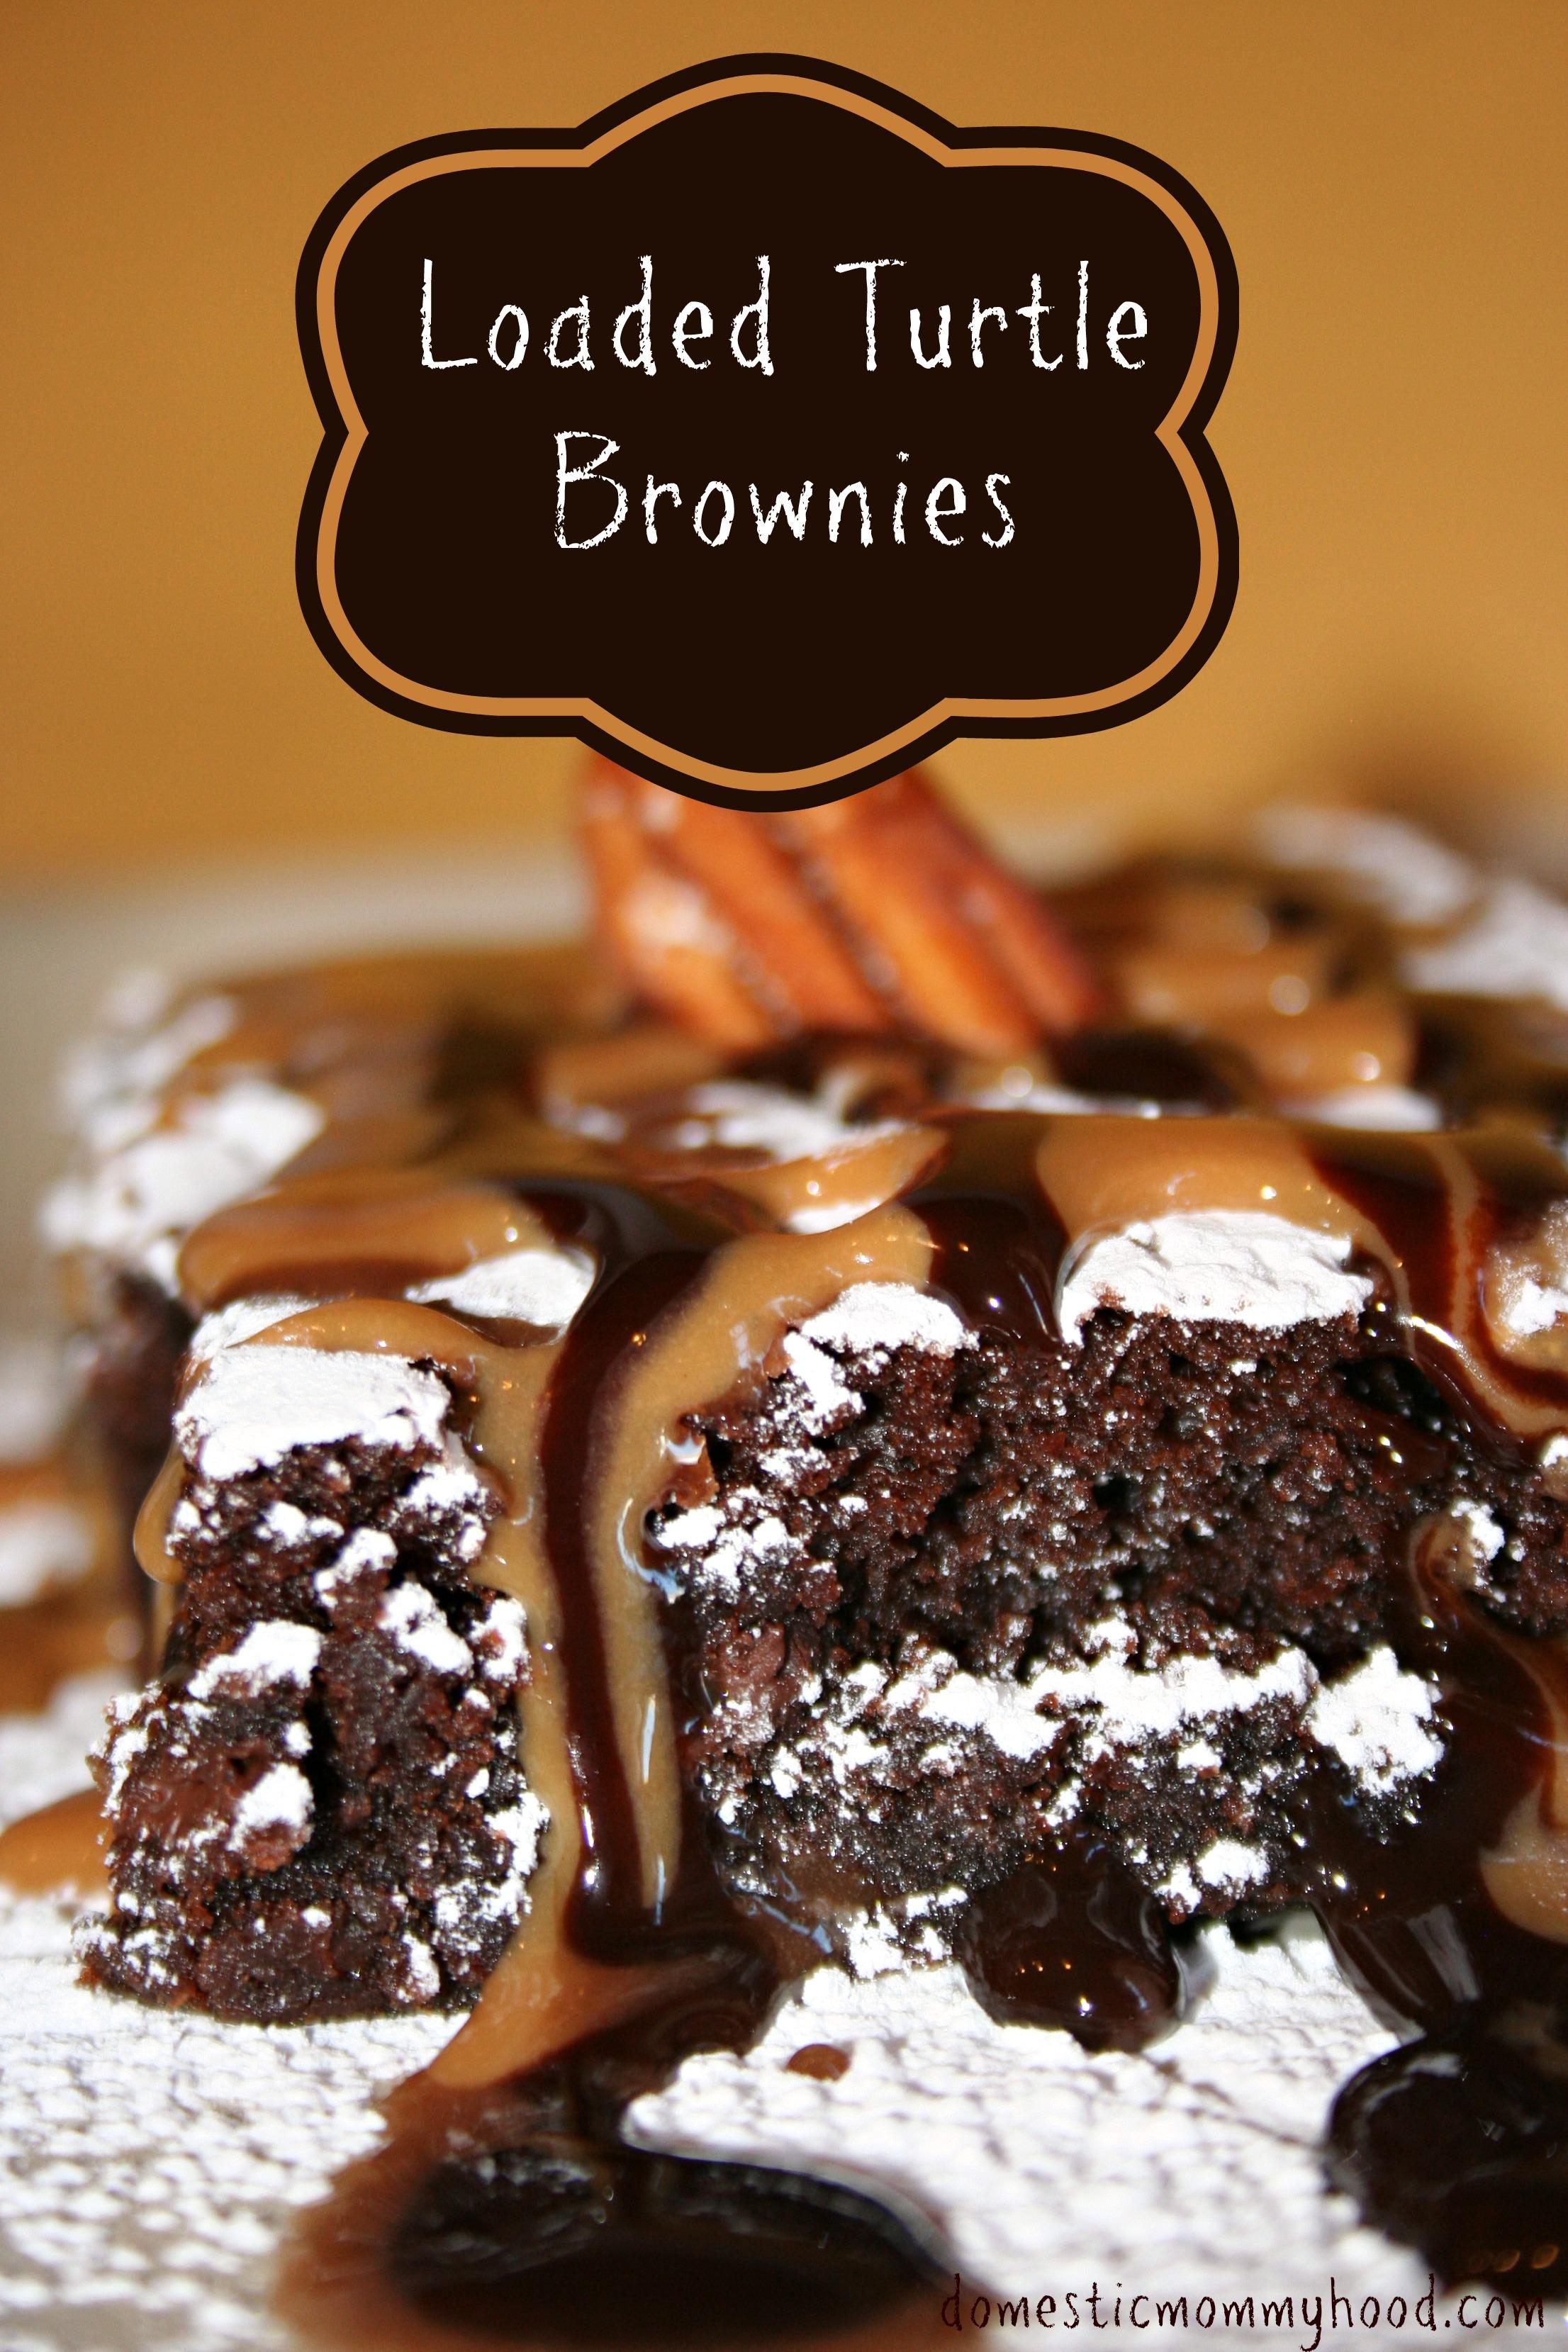 Turtle Brownies - Domestic Mommyhood